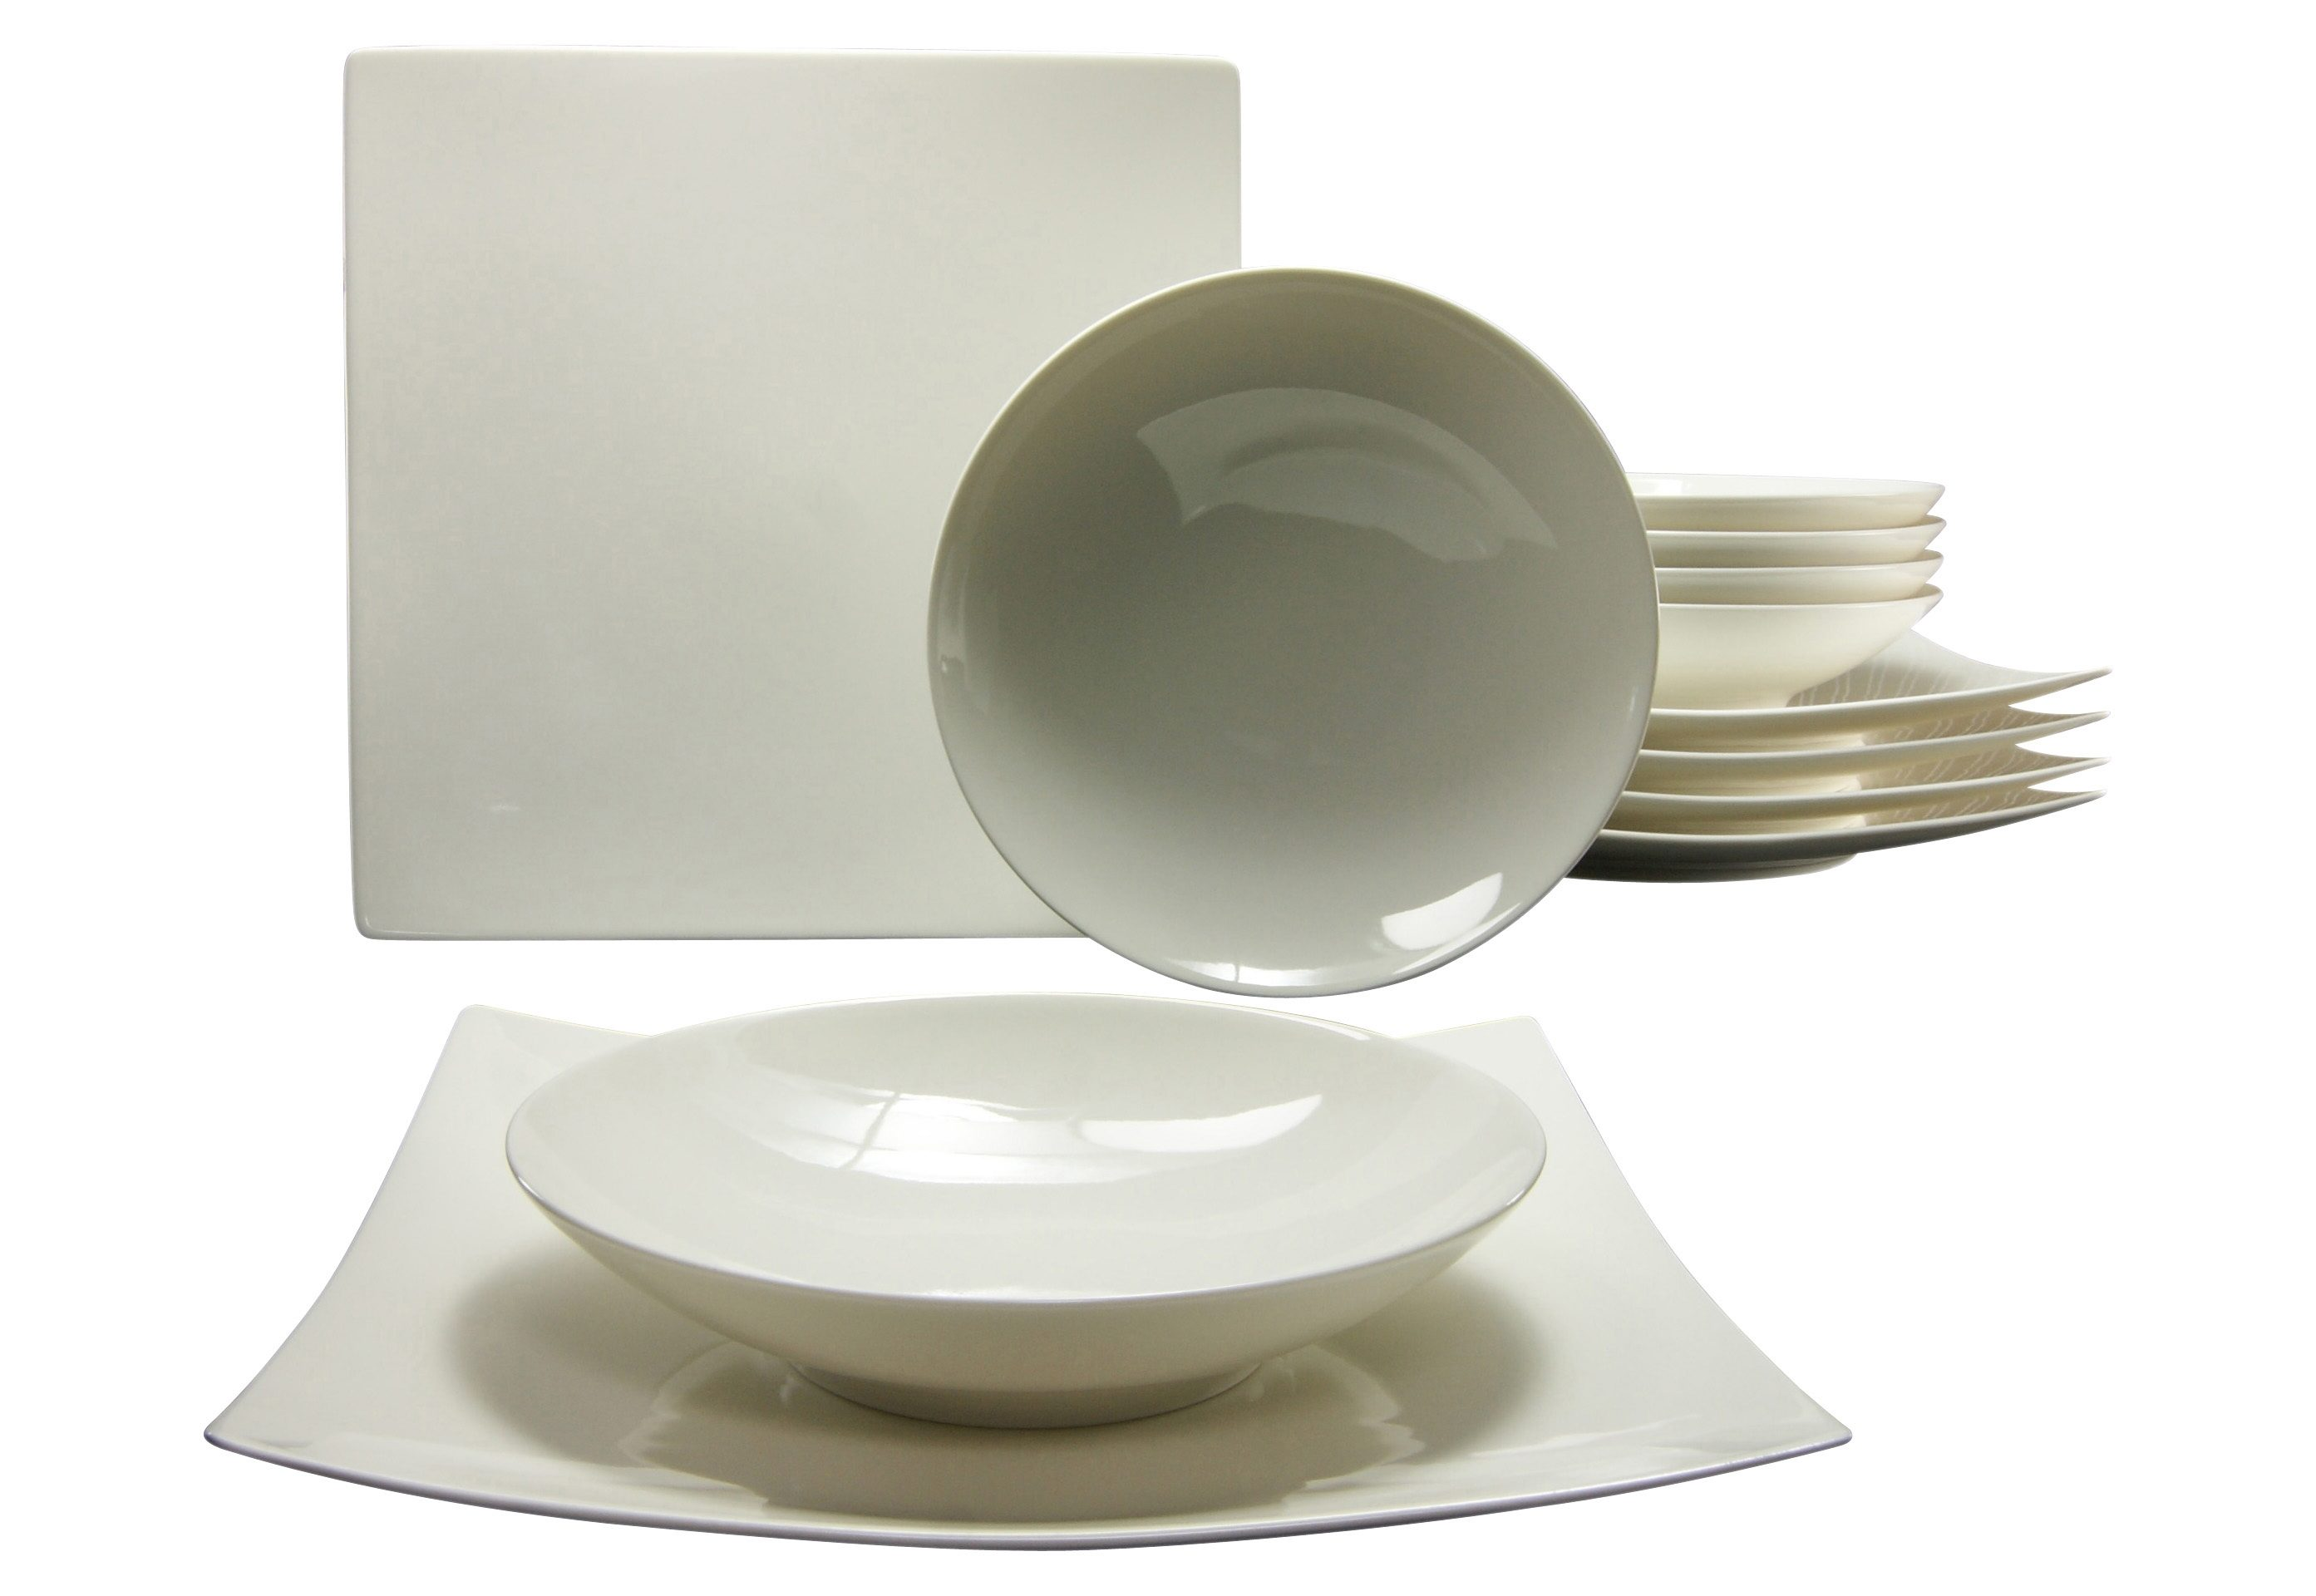 CreaTable Tafelservice, Porzellan, 12 Teile, »PURE«